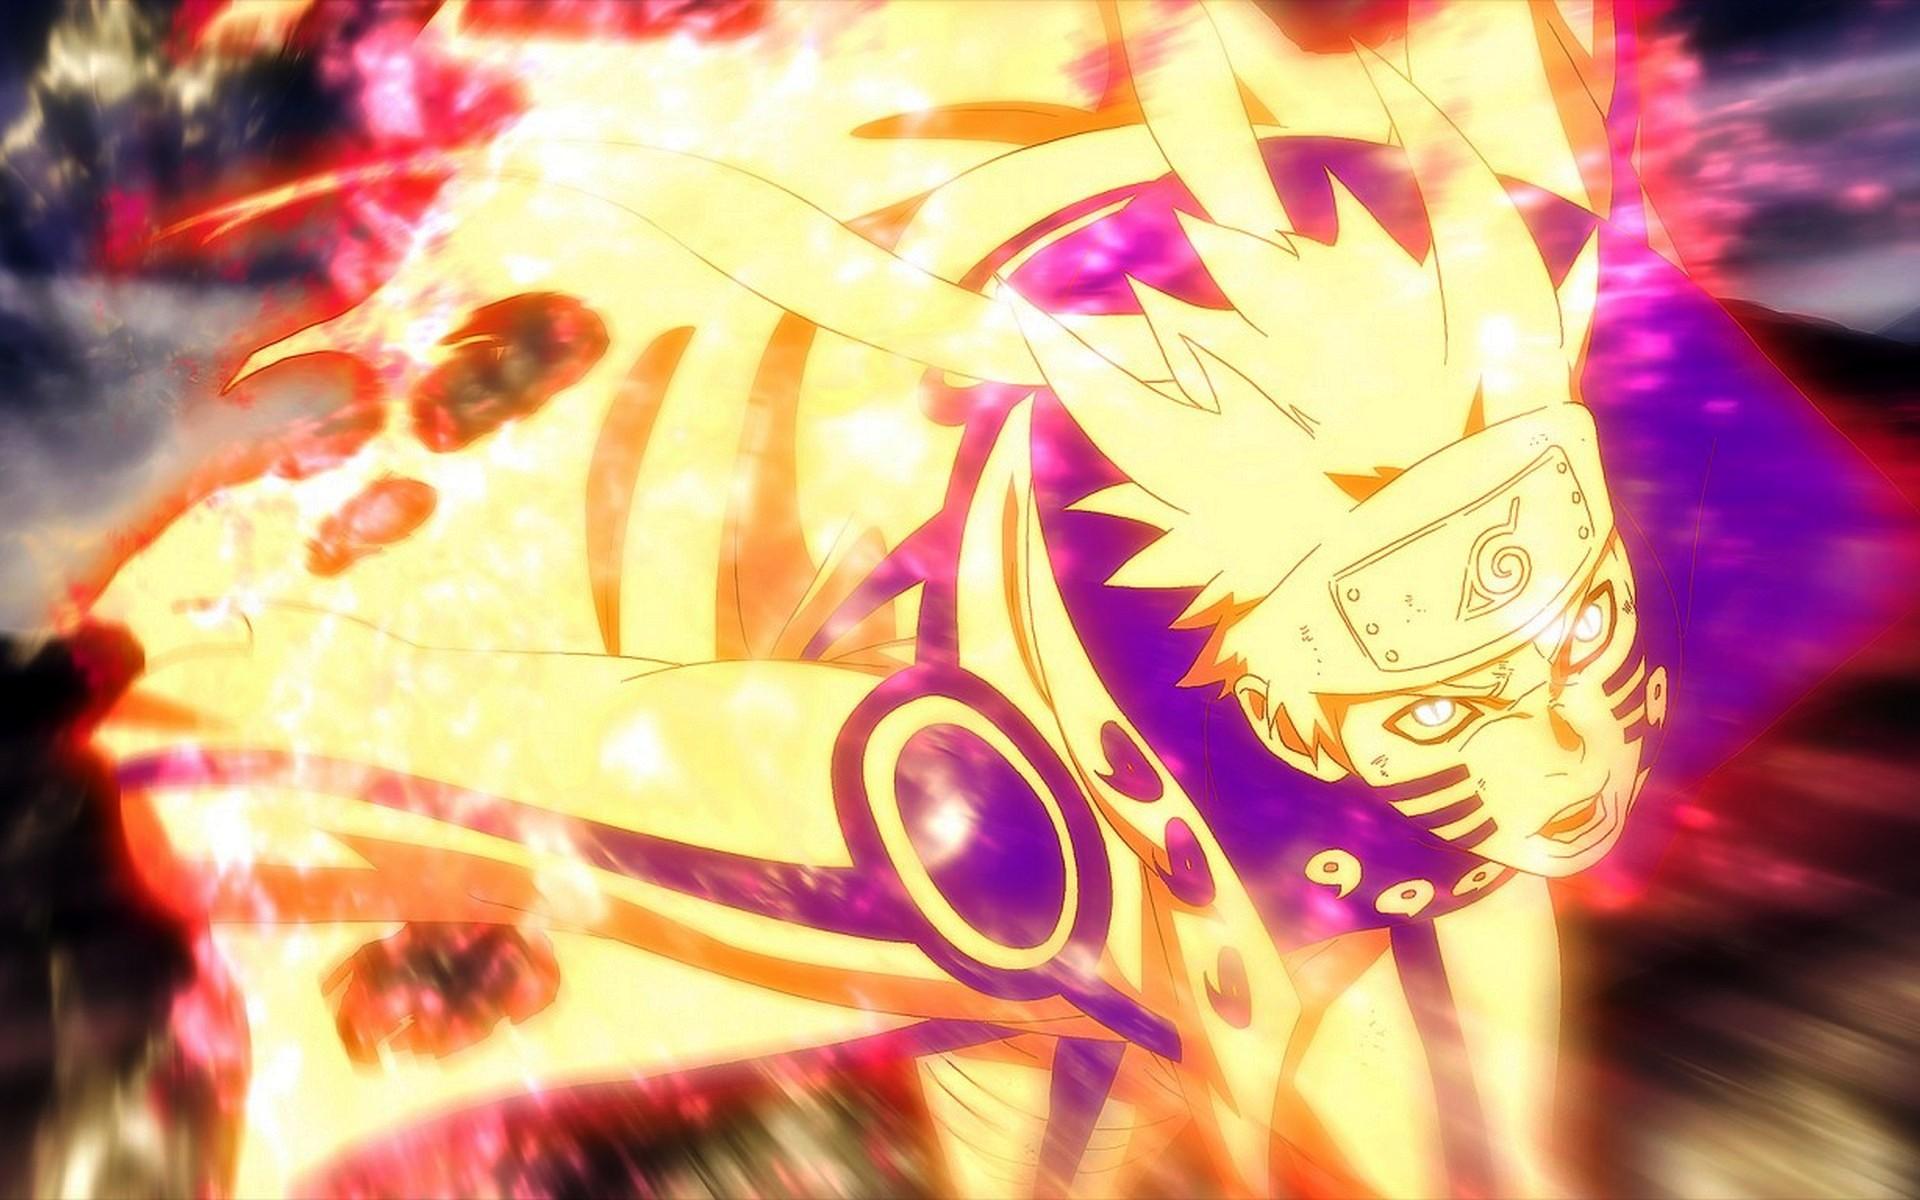 Download Naruto Shippuden Anime Wallpaper Full Hd 1920x1200